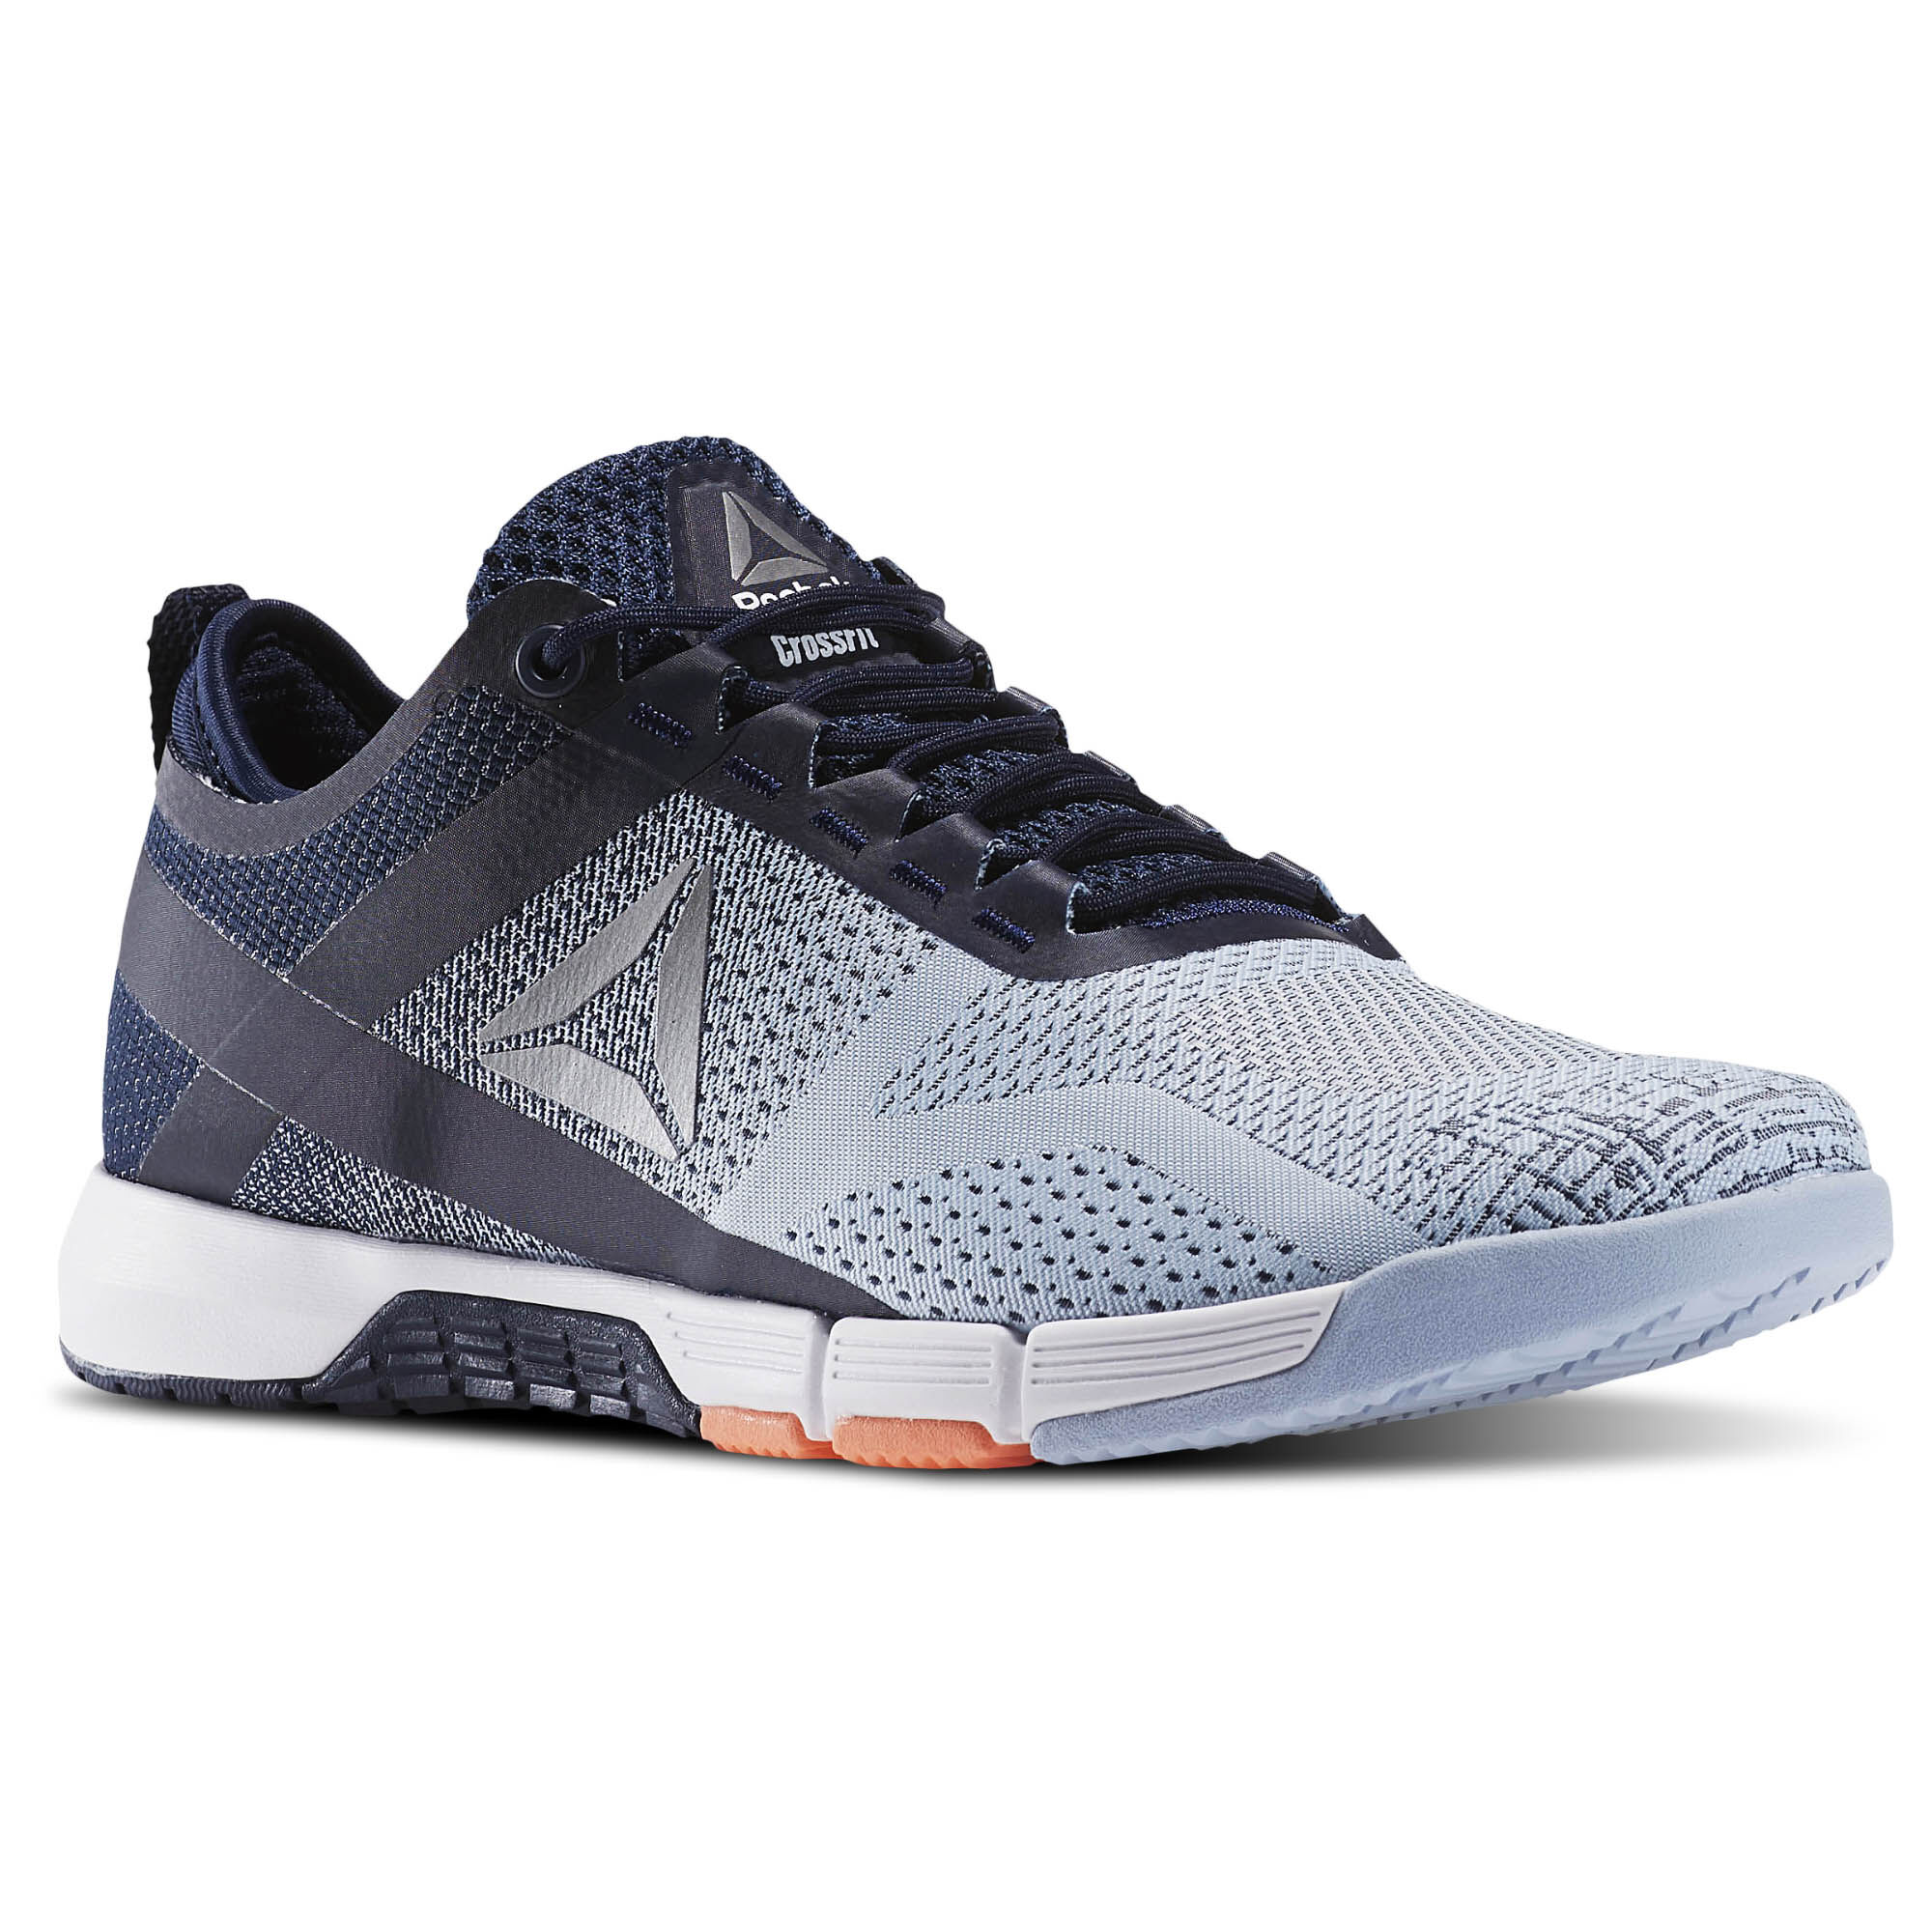 Crossfit Shoes Uk